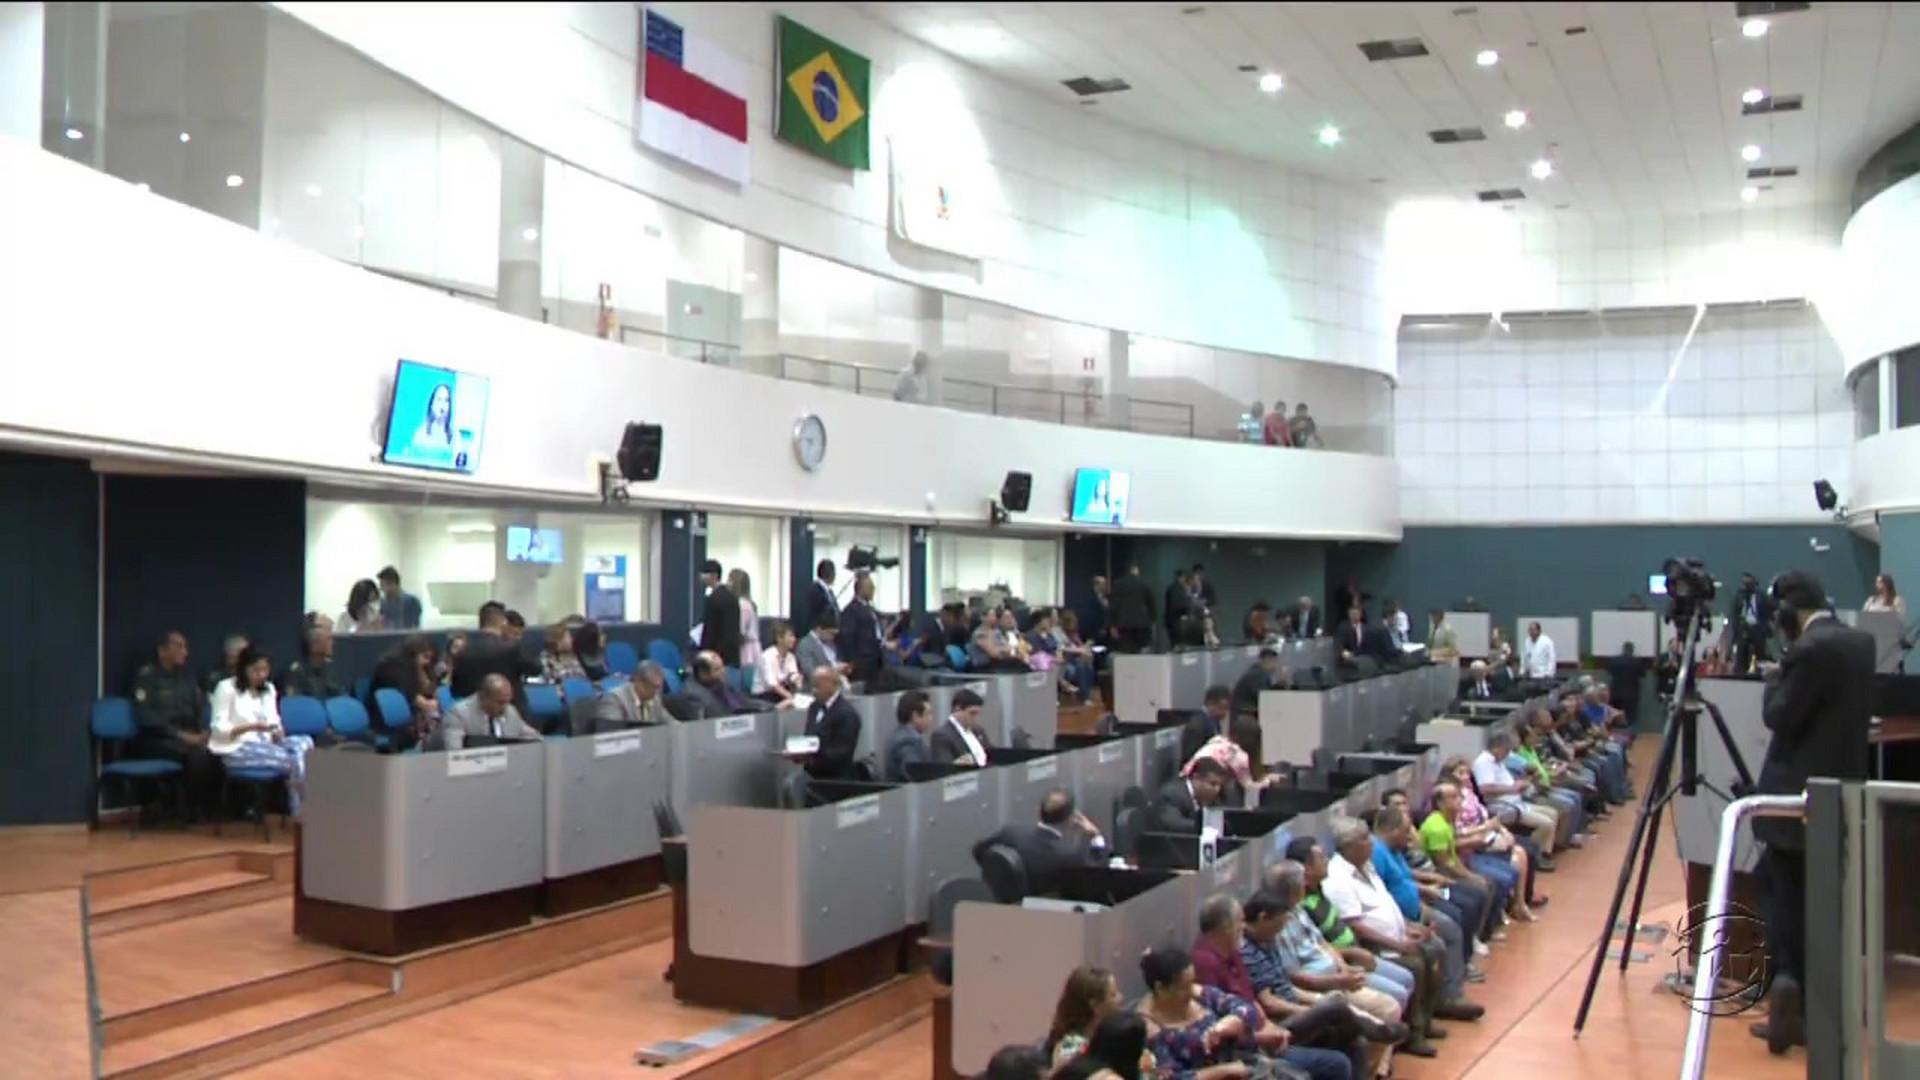 COMISSÃO PARLAMENTAR INVESTIGA MANAUS AMBIENTAL - A Crítica Na Tv - 12/12/17